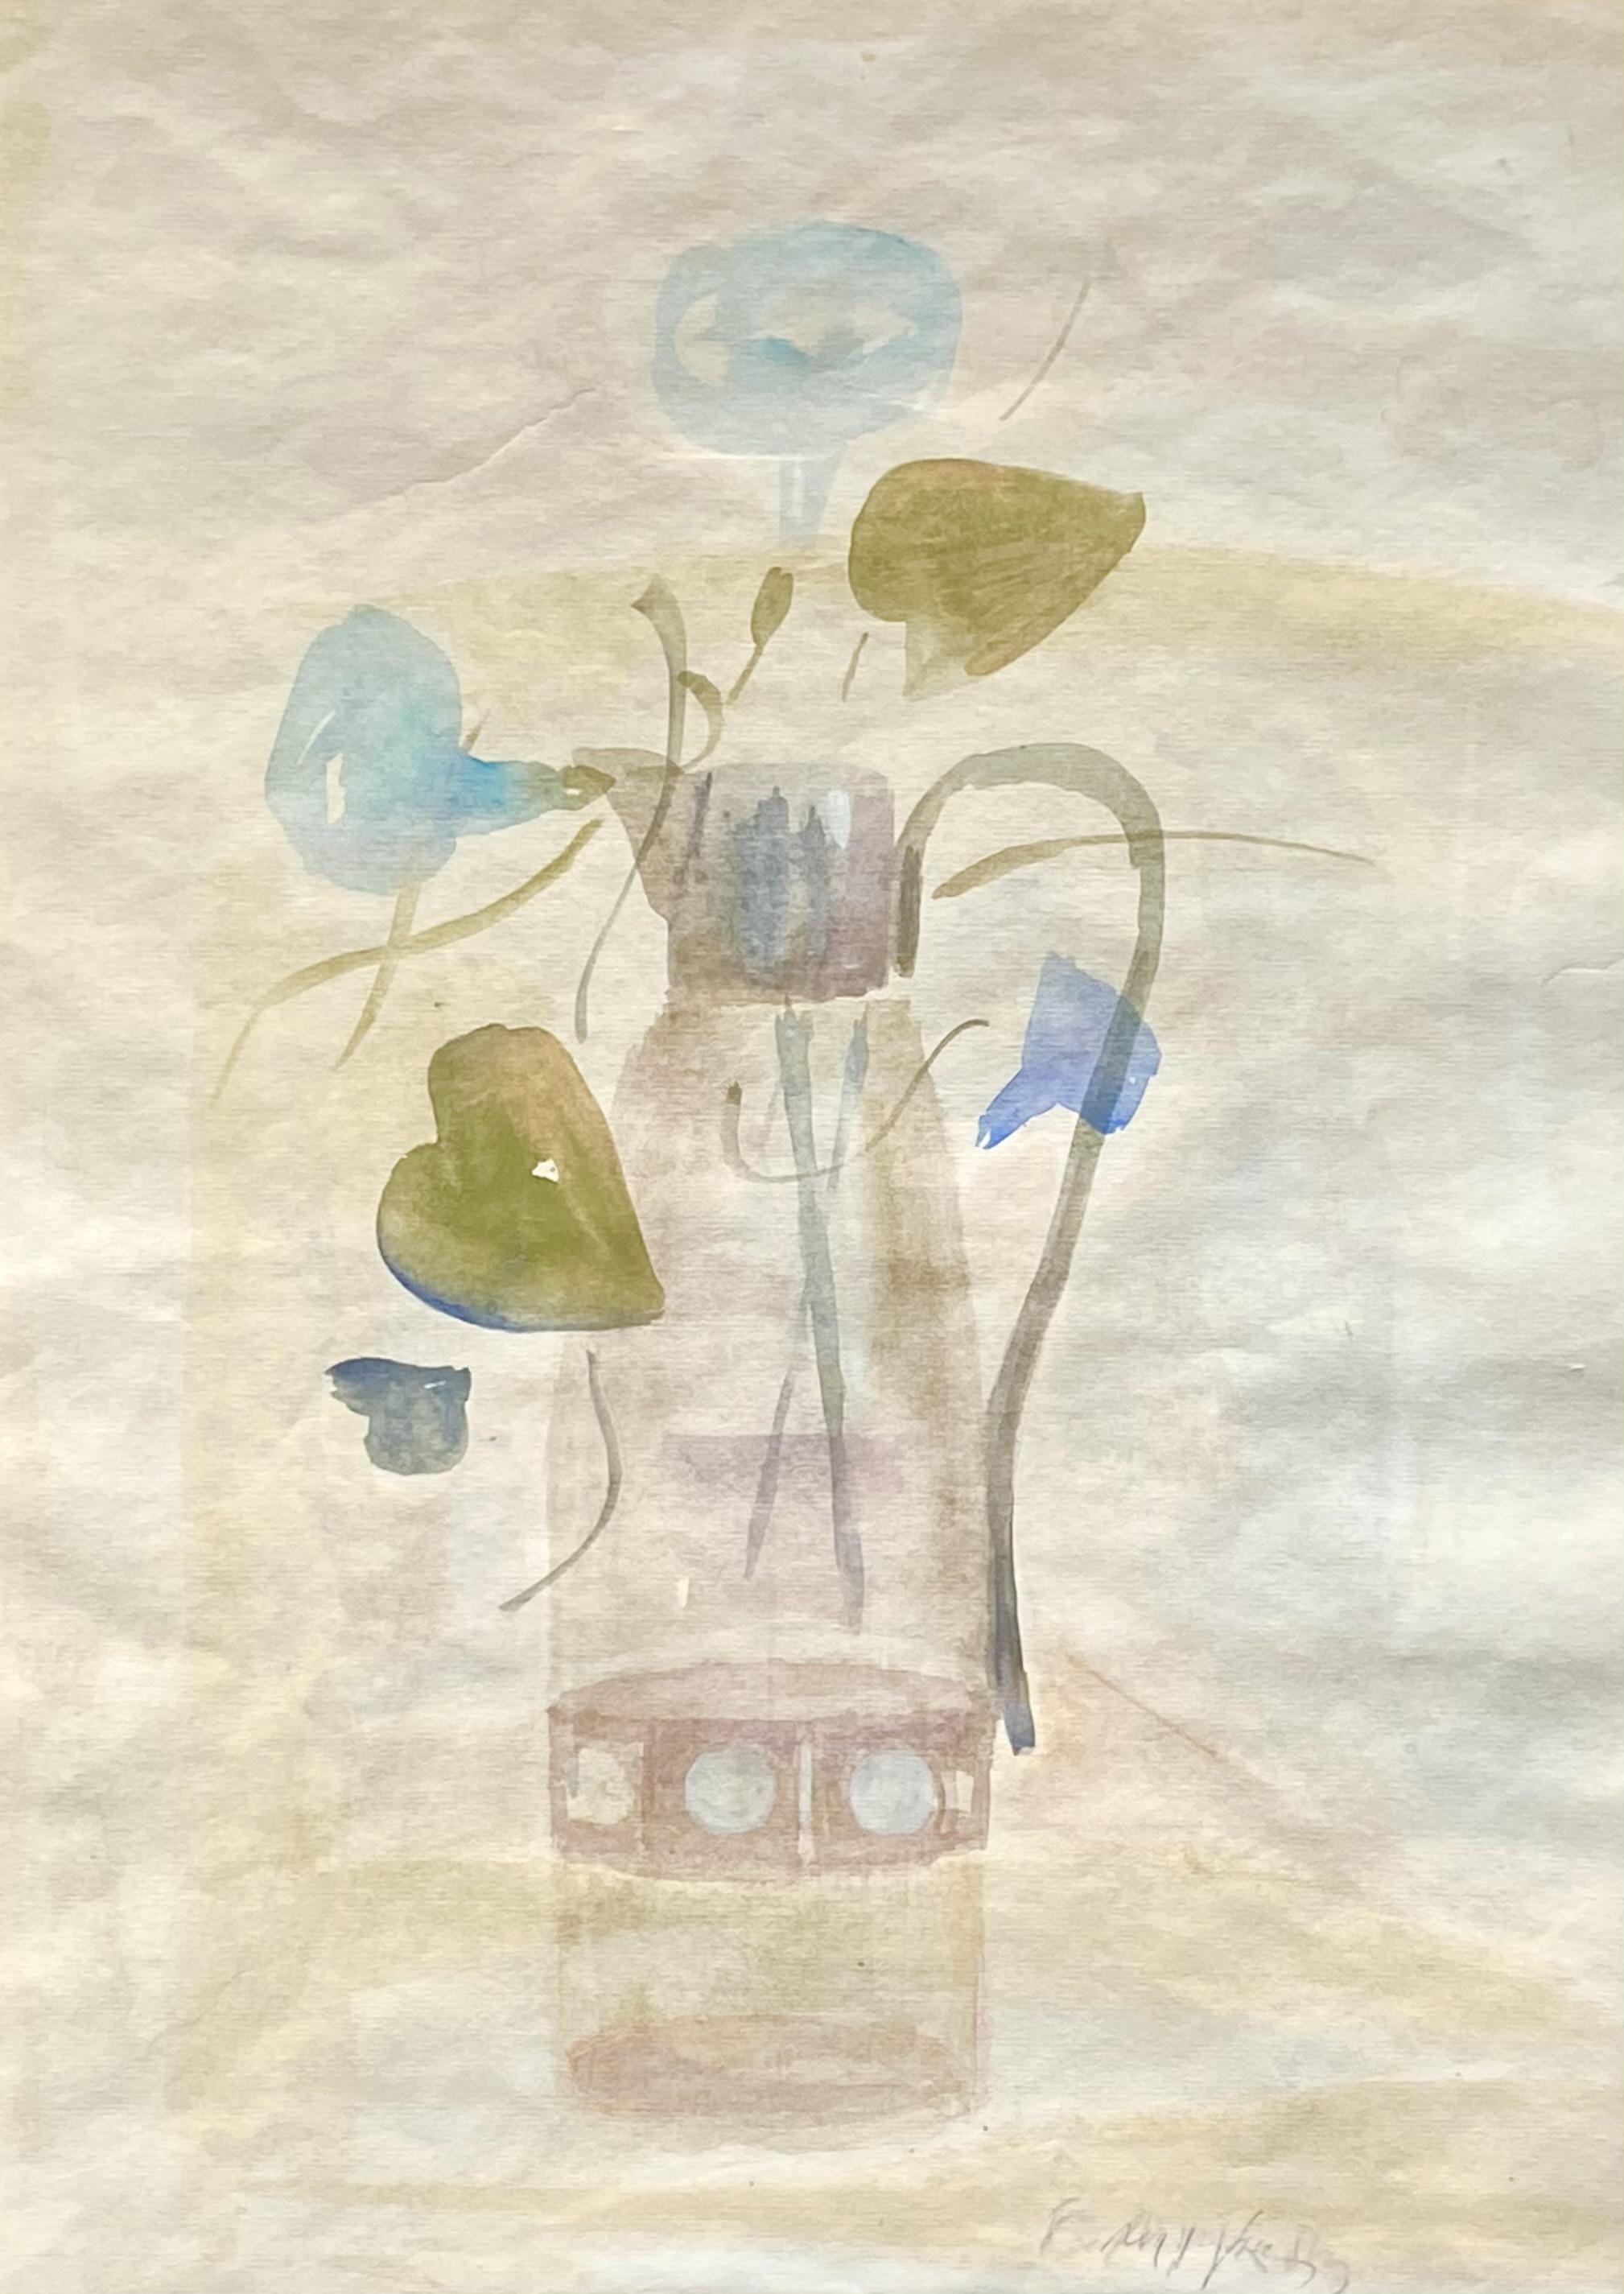 Yiannis Migadis (Greek, 1926-2017) (AR), Still life, watercolor on paper, 40 x 30 cm.